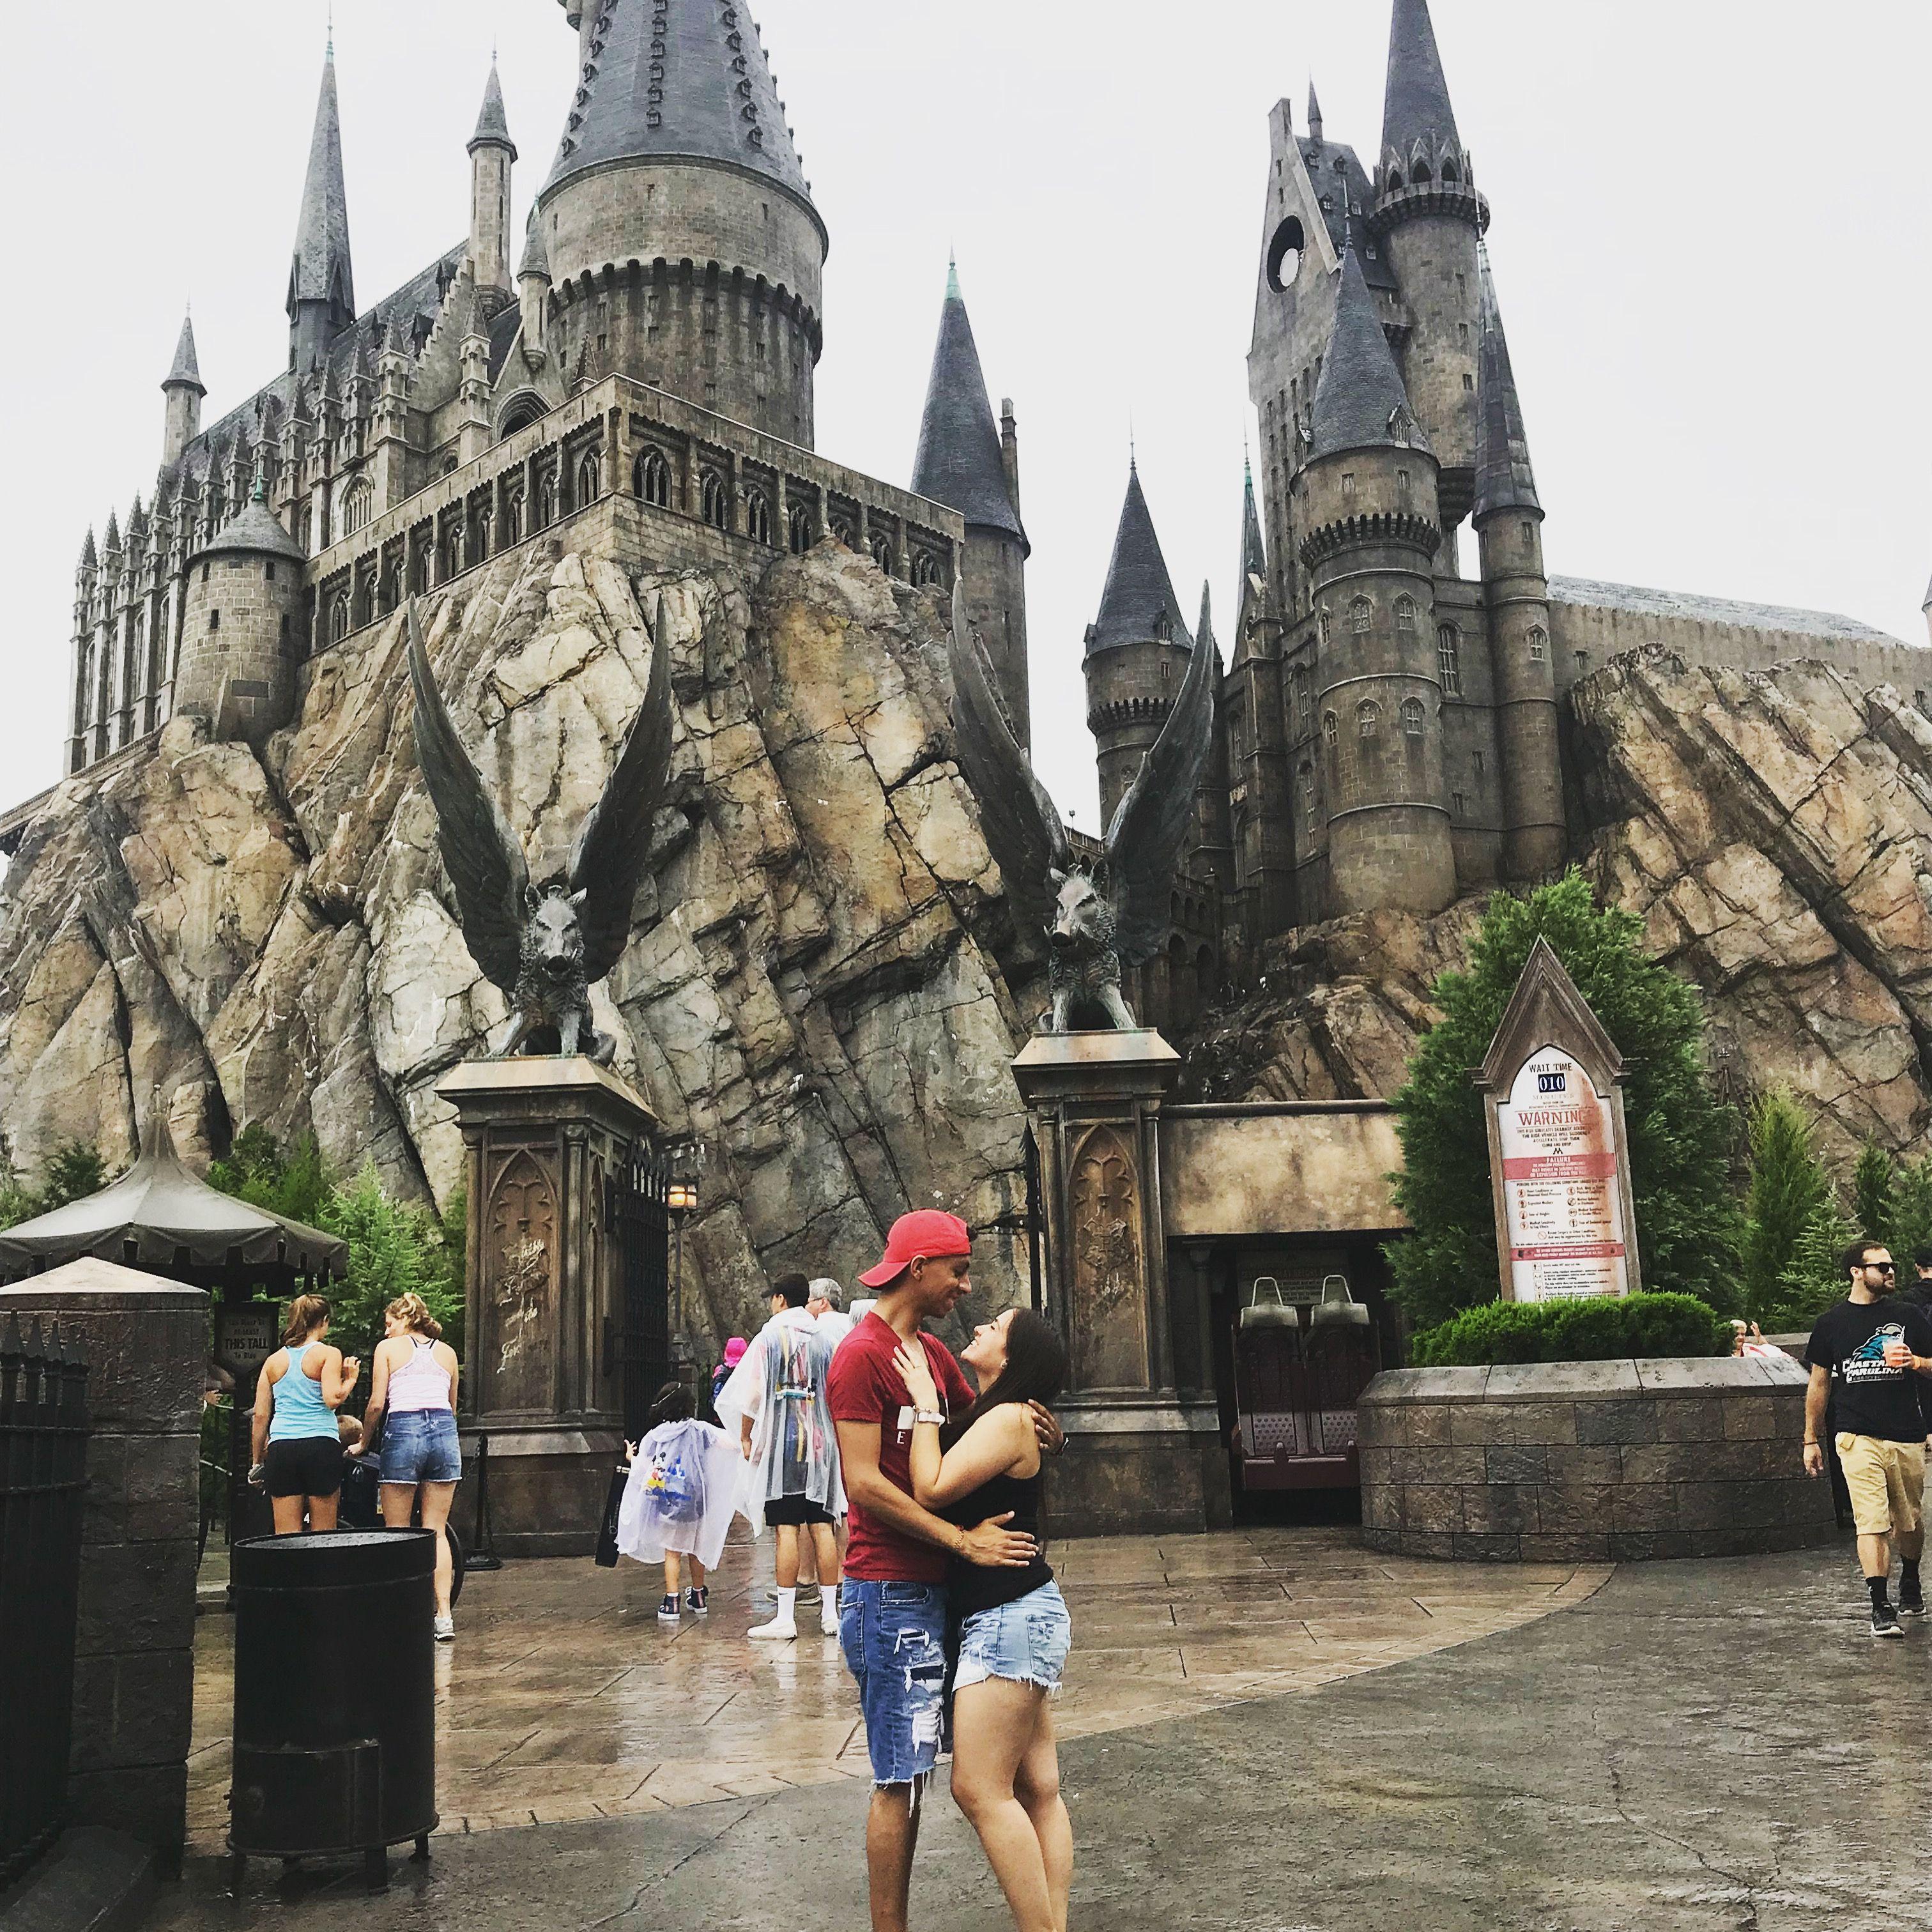 Castle Pic At Harry Potter Harry Potter Universal Studios Universal Studios Islands Of Adventure